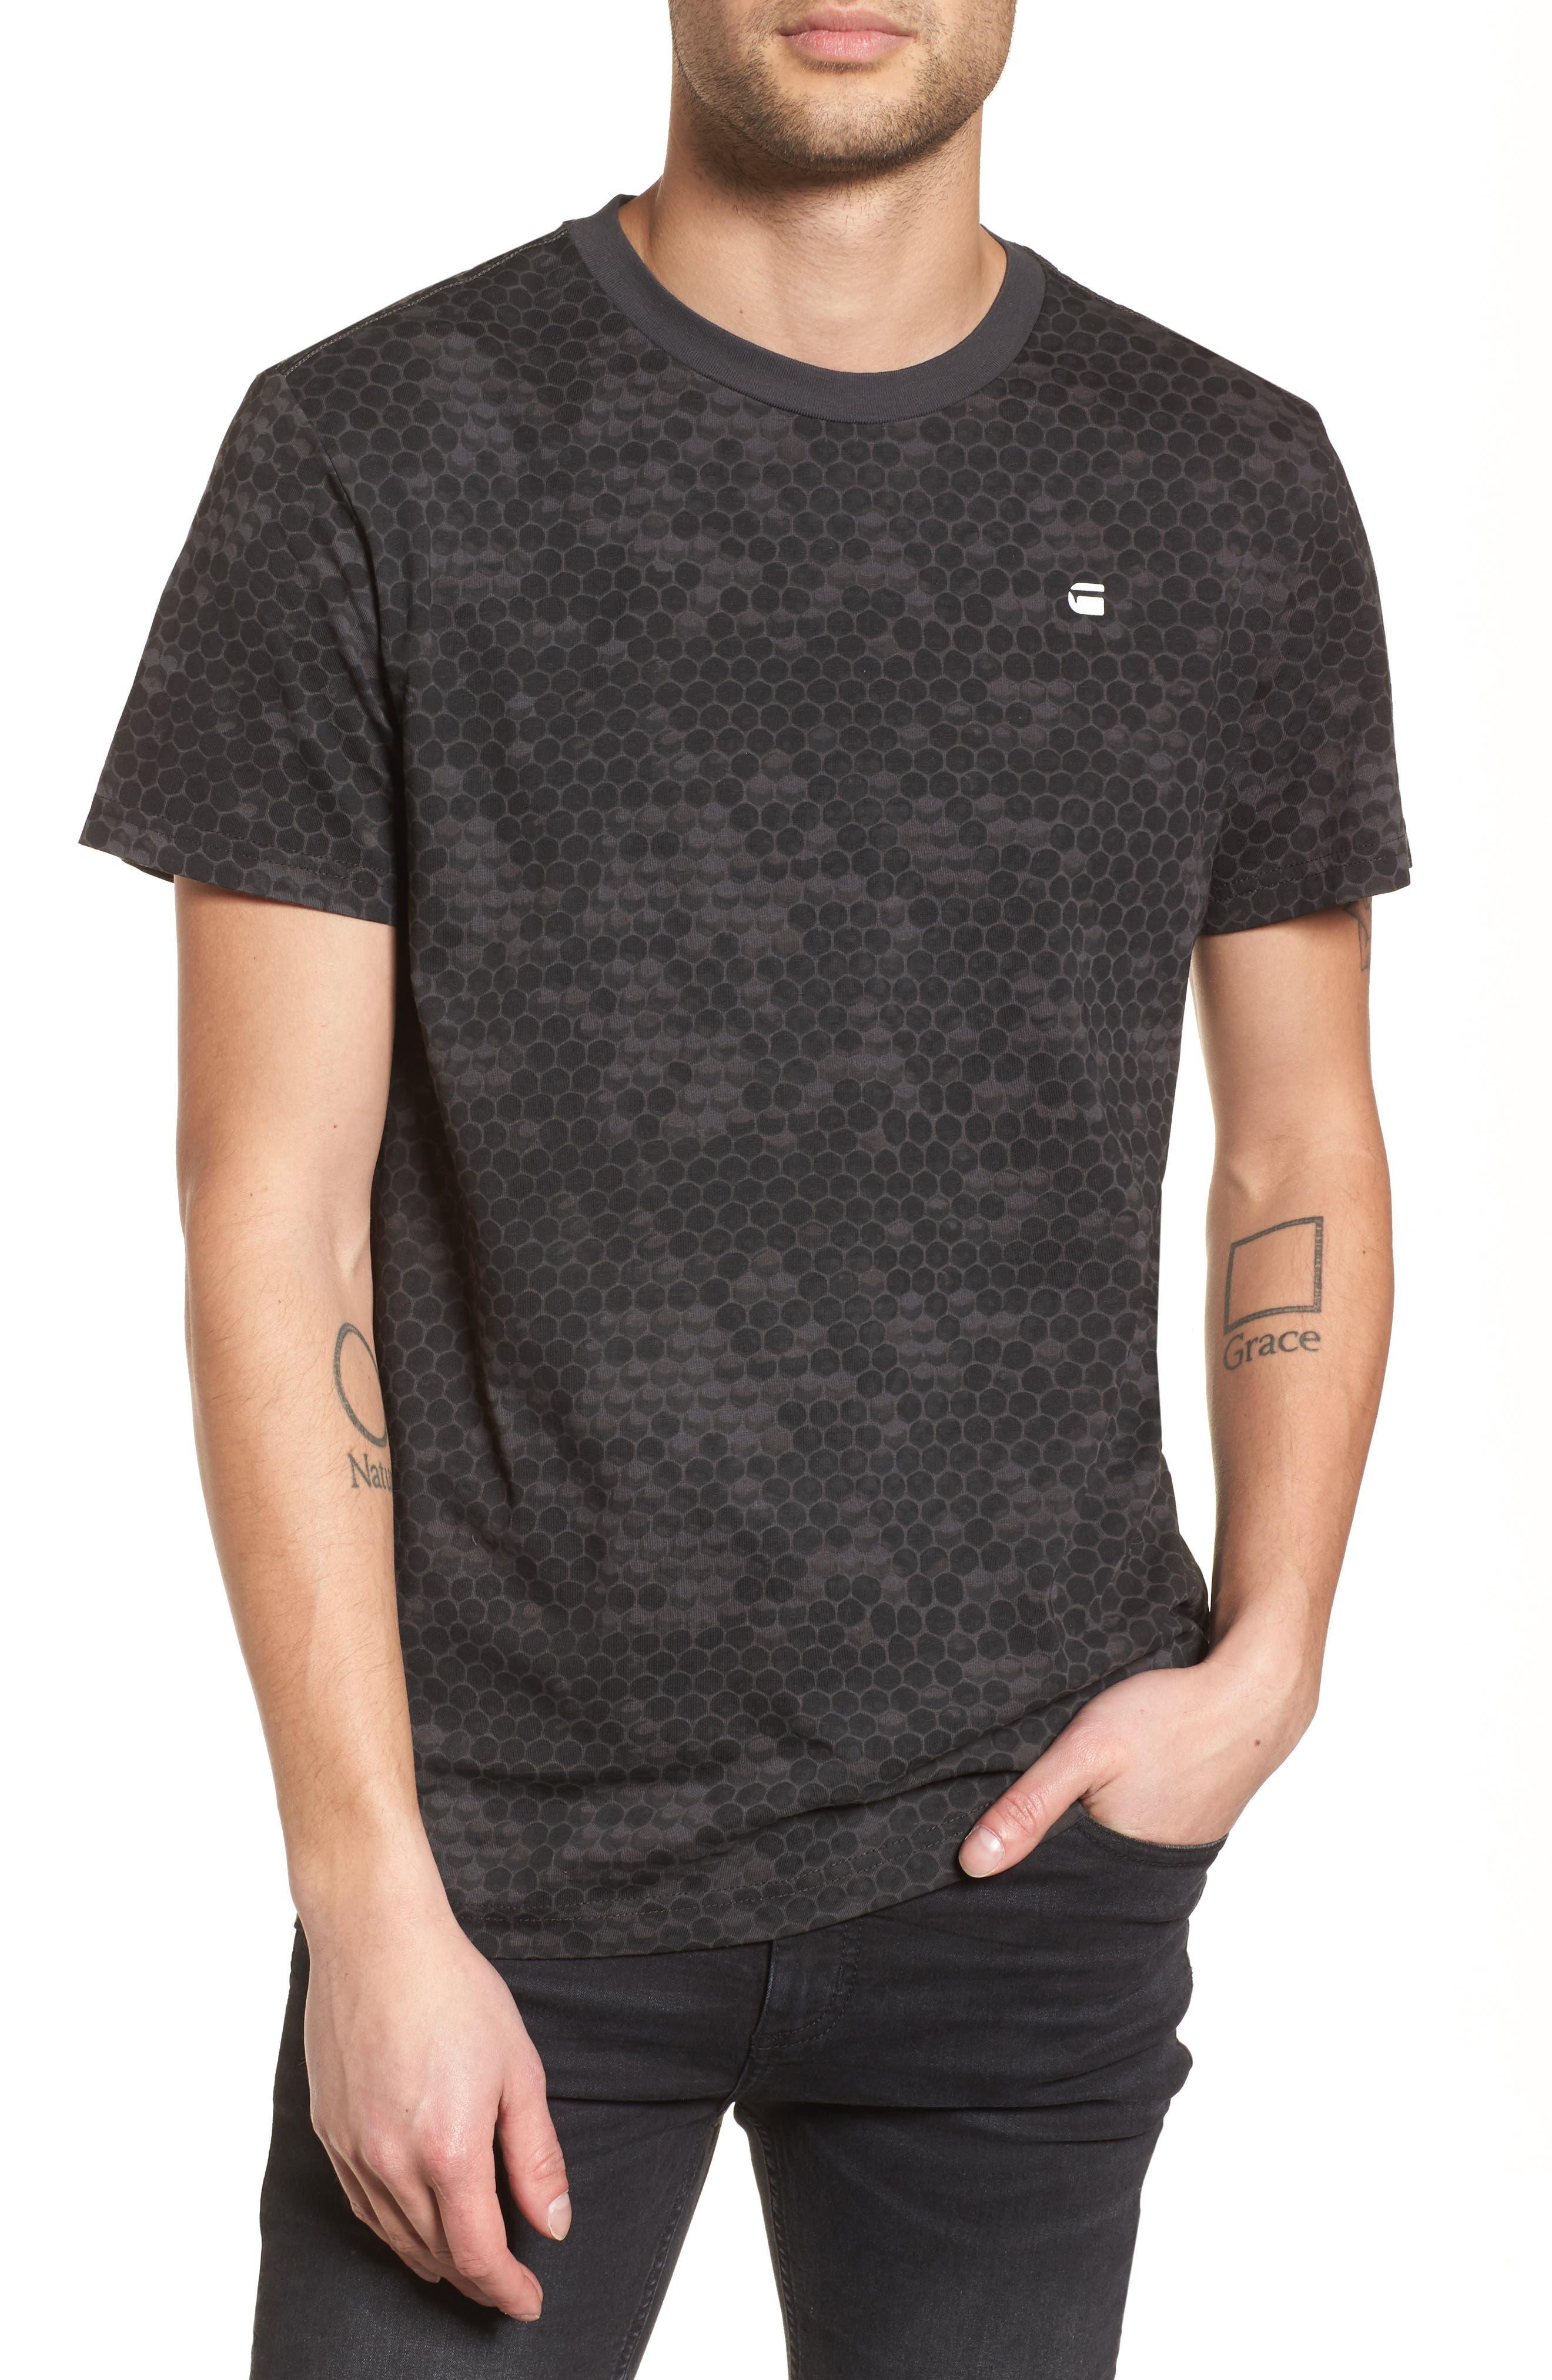 G-Star Raw Classic Hoc T-Shirt